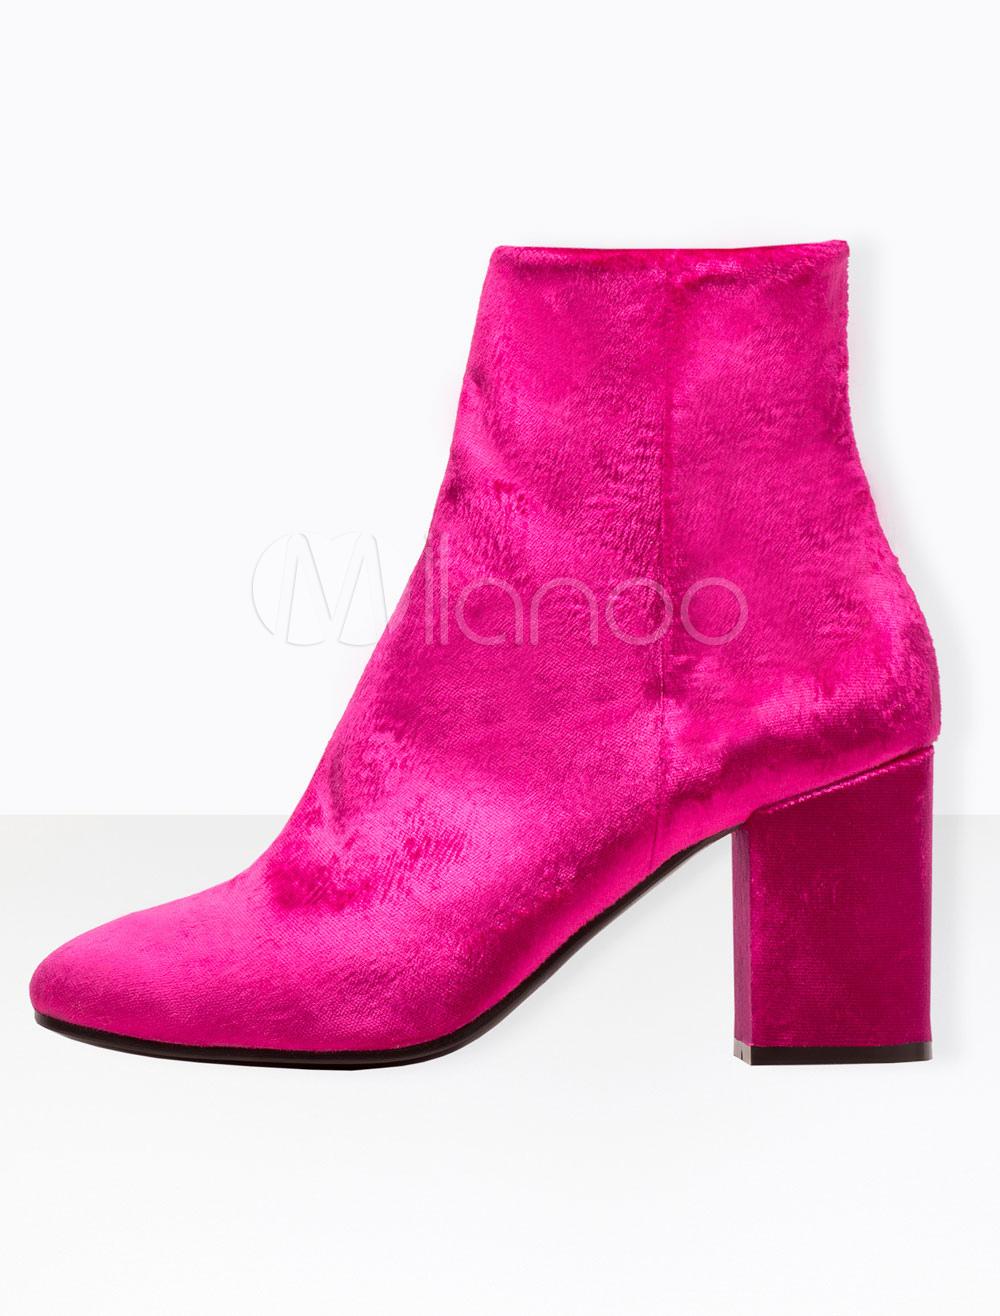 Buy Rose Ankle Boots High Heel Women's Velvet Pointed Toe Chunky Heel Booties for $94.49 in Milanoo store